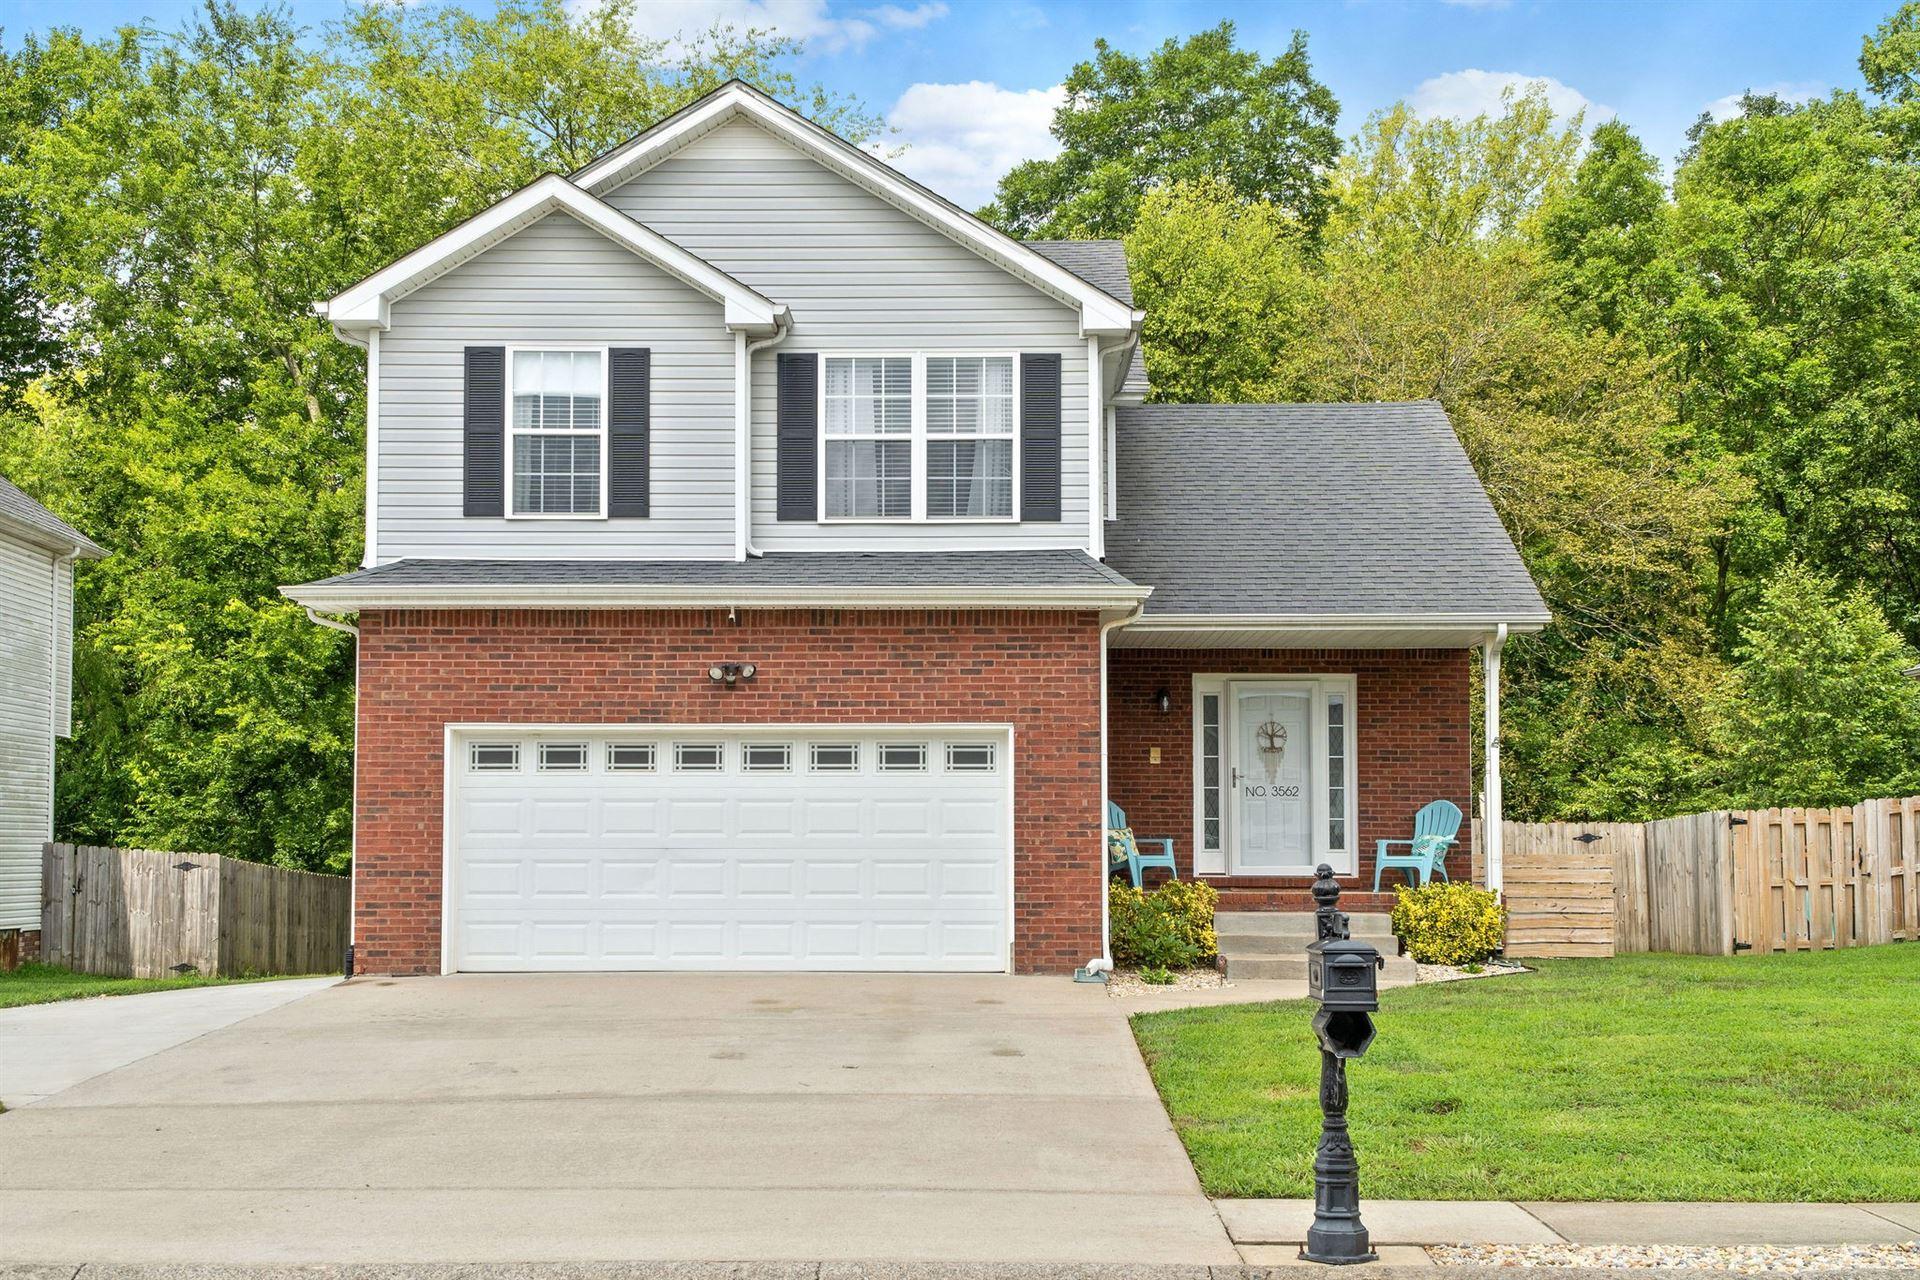 3562 Southwood Dr, Clarksville, TN 37042 - MLS#: 2253160